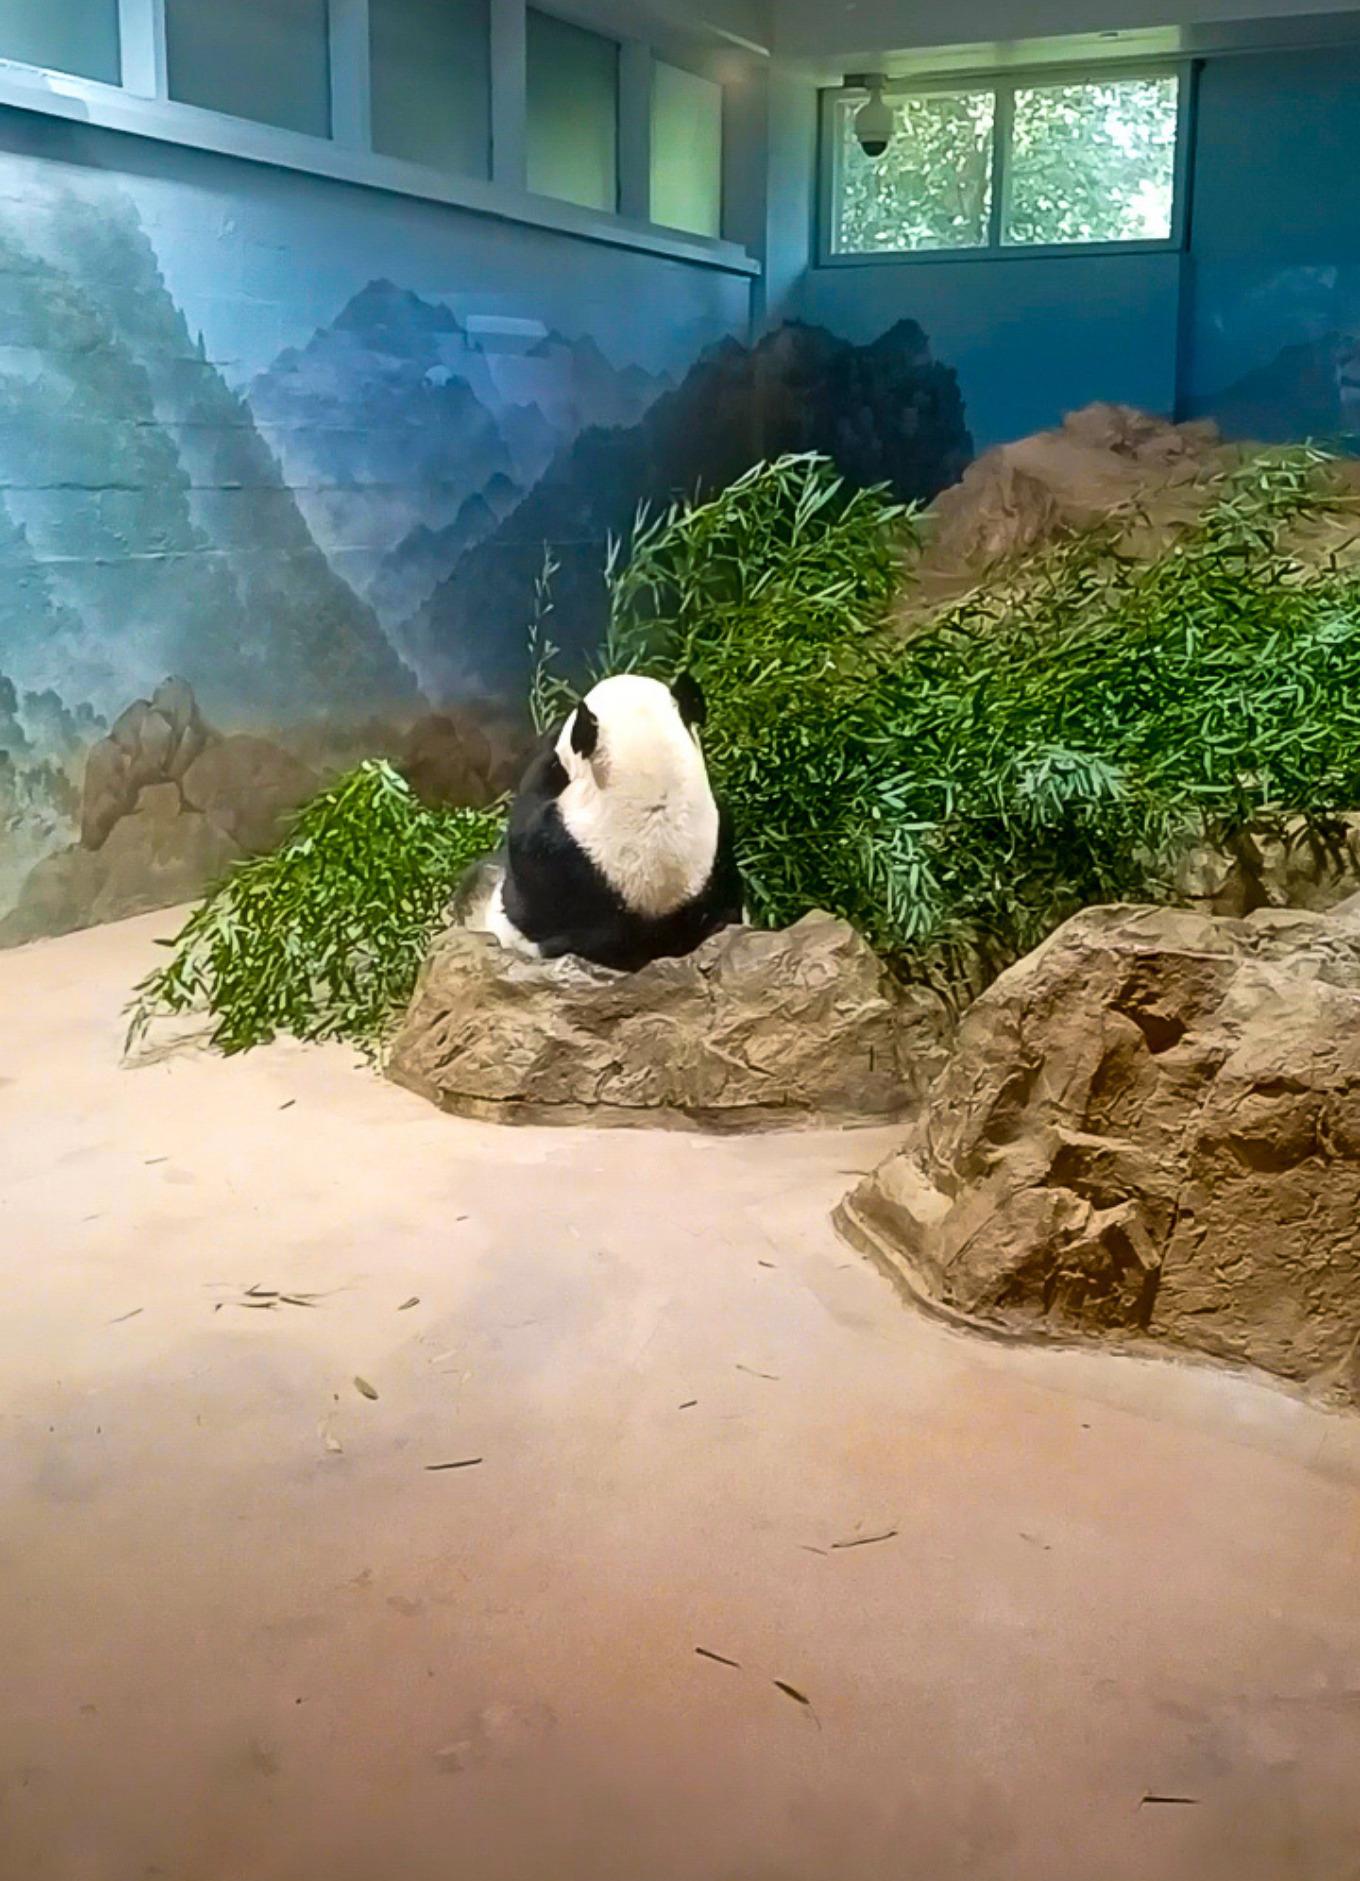 A giant panda turns his back at Washington DC's National Zoo